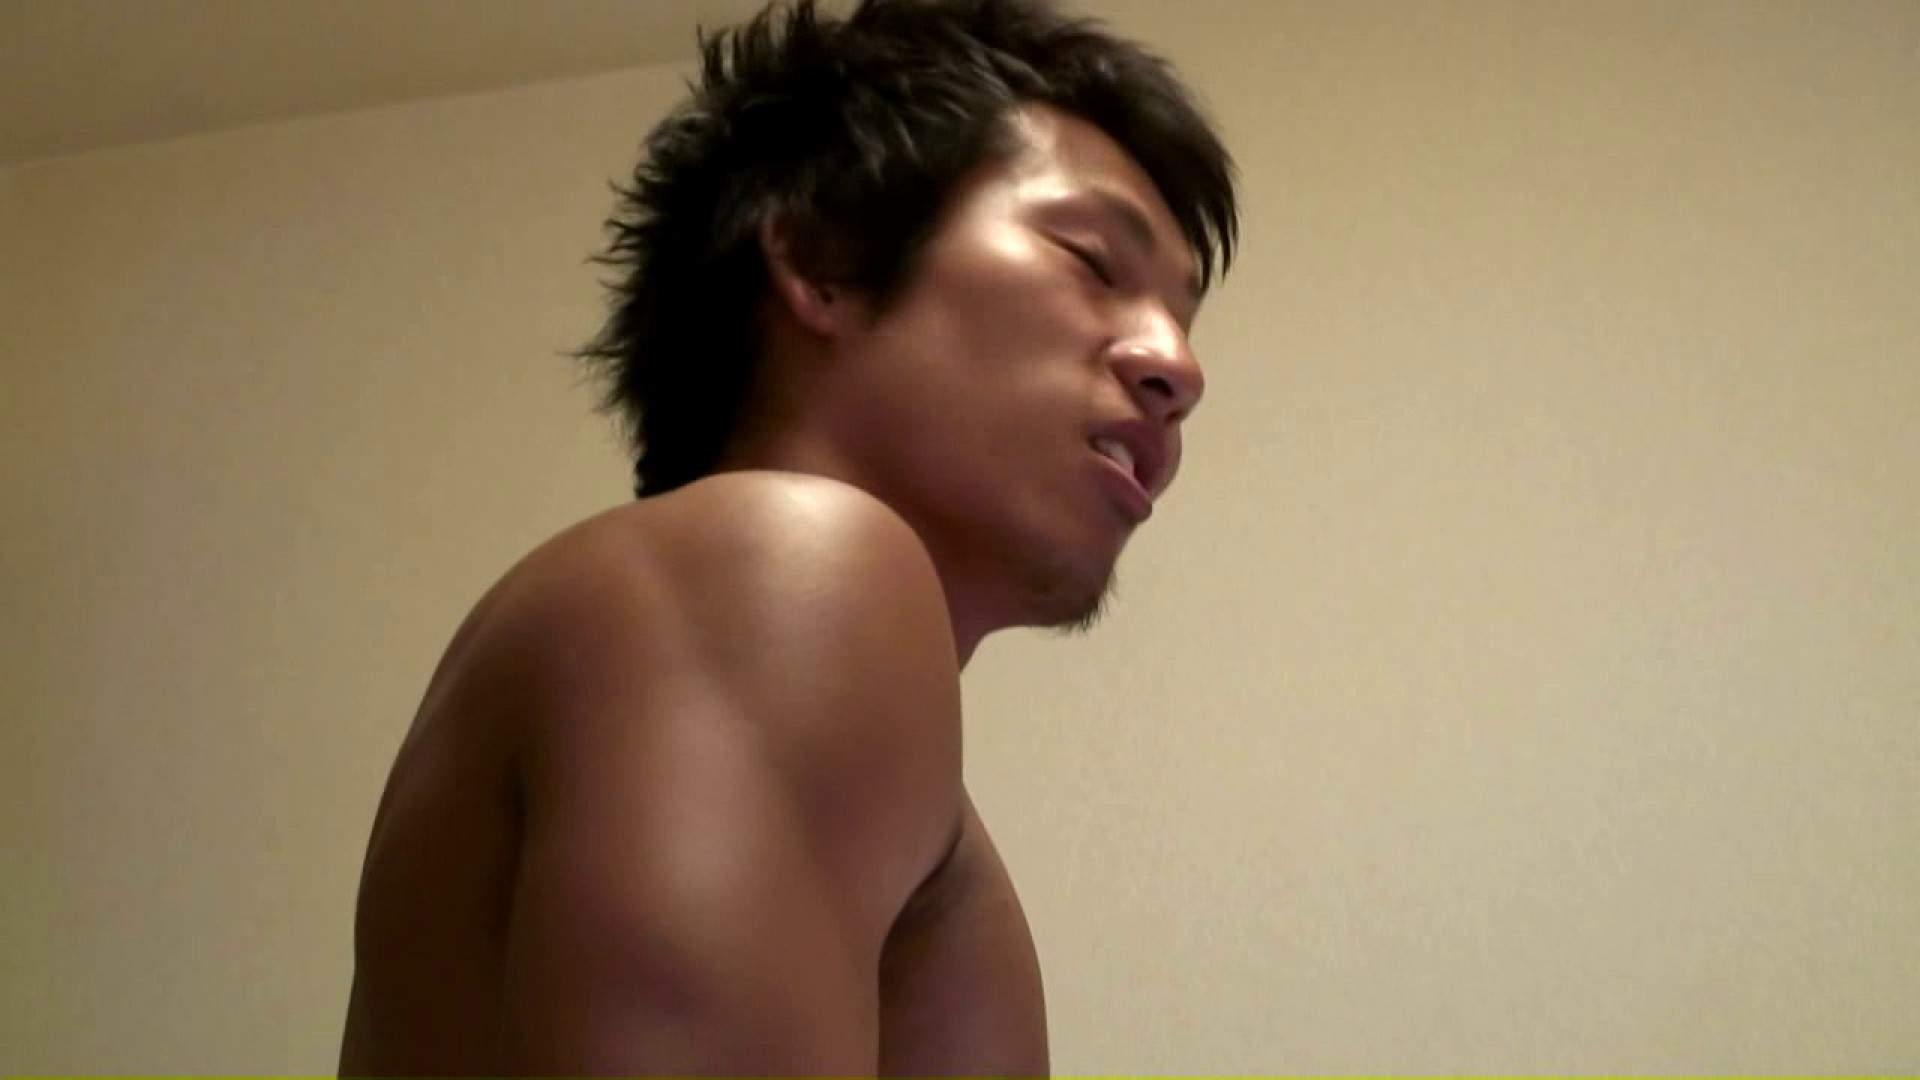 muscle warrior ~男根肉弾戦~03 イケメンたち ゲイモロ画像 98pic 41